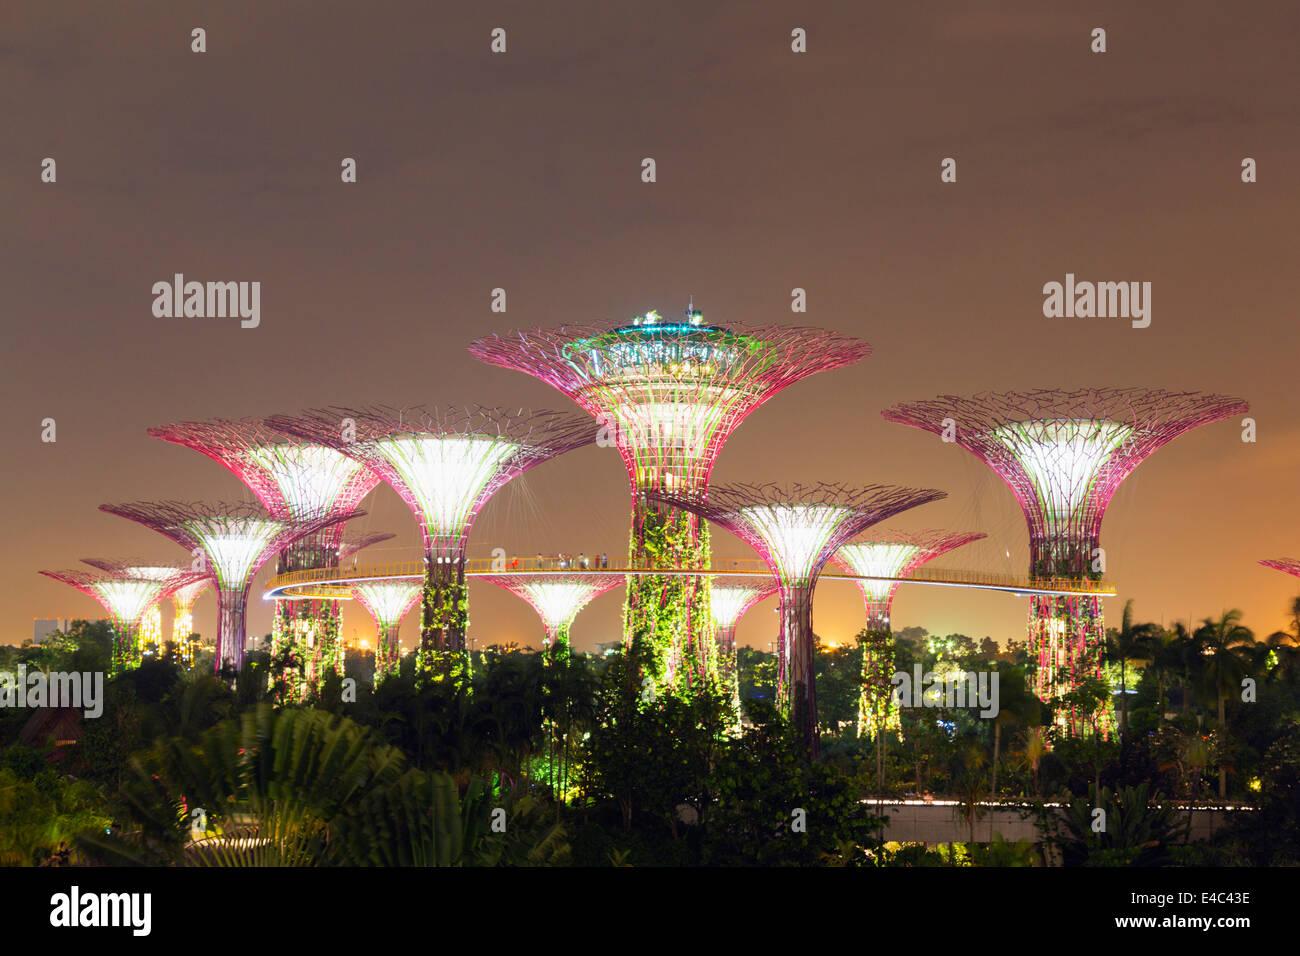 East asia forex singapore